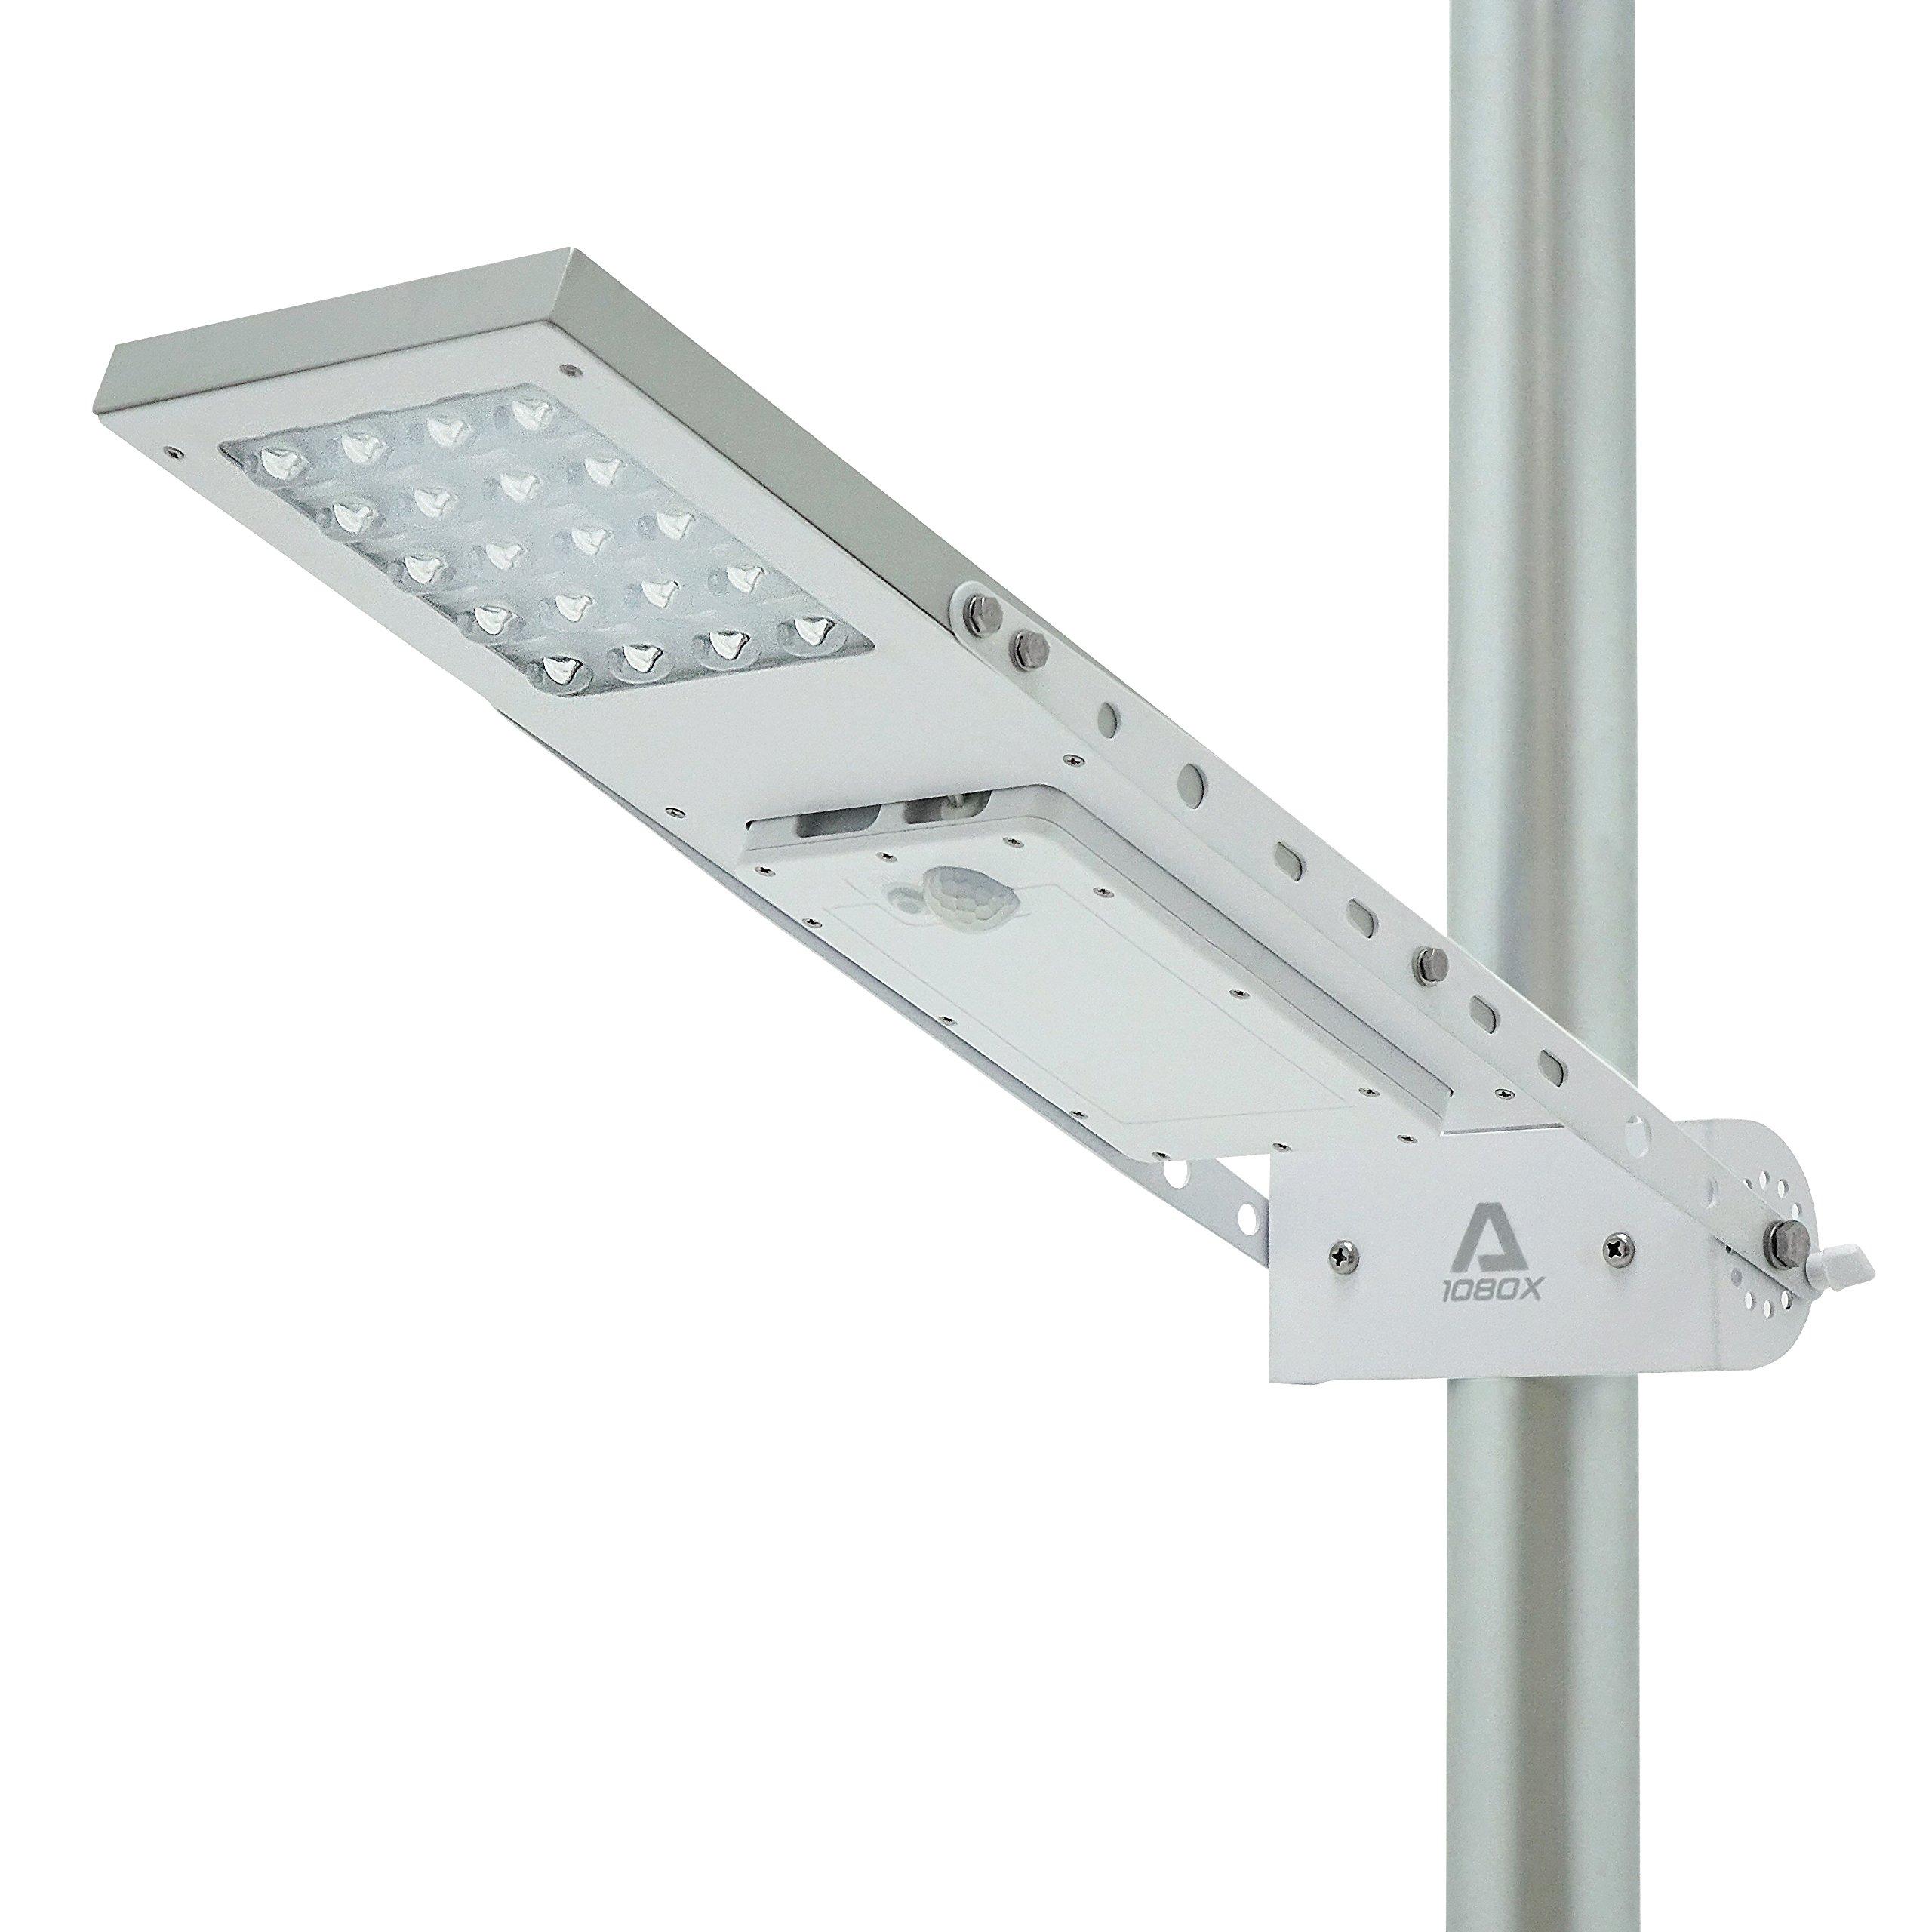 ALPHA 1080X Street Light , 3-Mode Setting, Lithium Battery, Adjustable Mounting Bracket for Optimum Sunlight Exposure, Fit Max Pole Diameter 3''